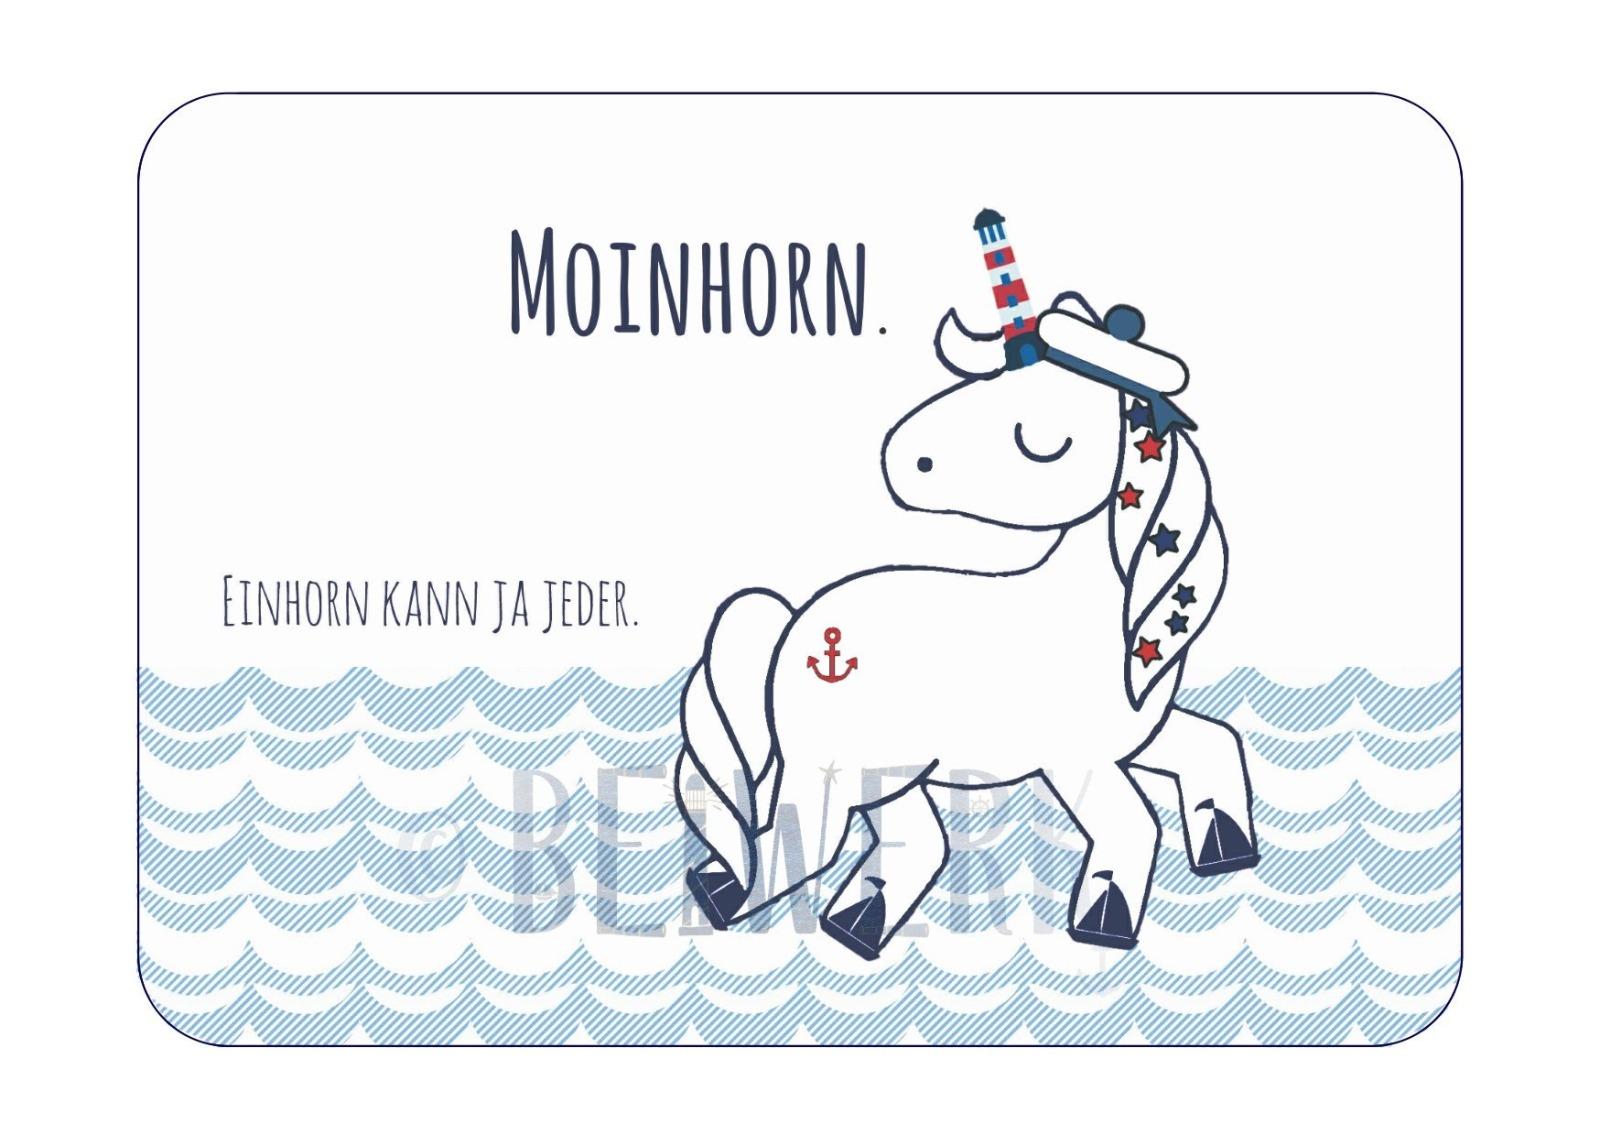 Postkarte Moinhorn - 1